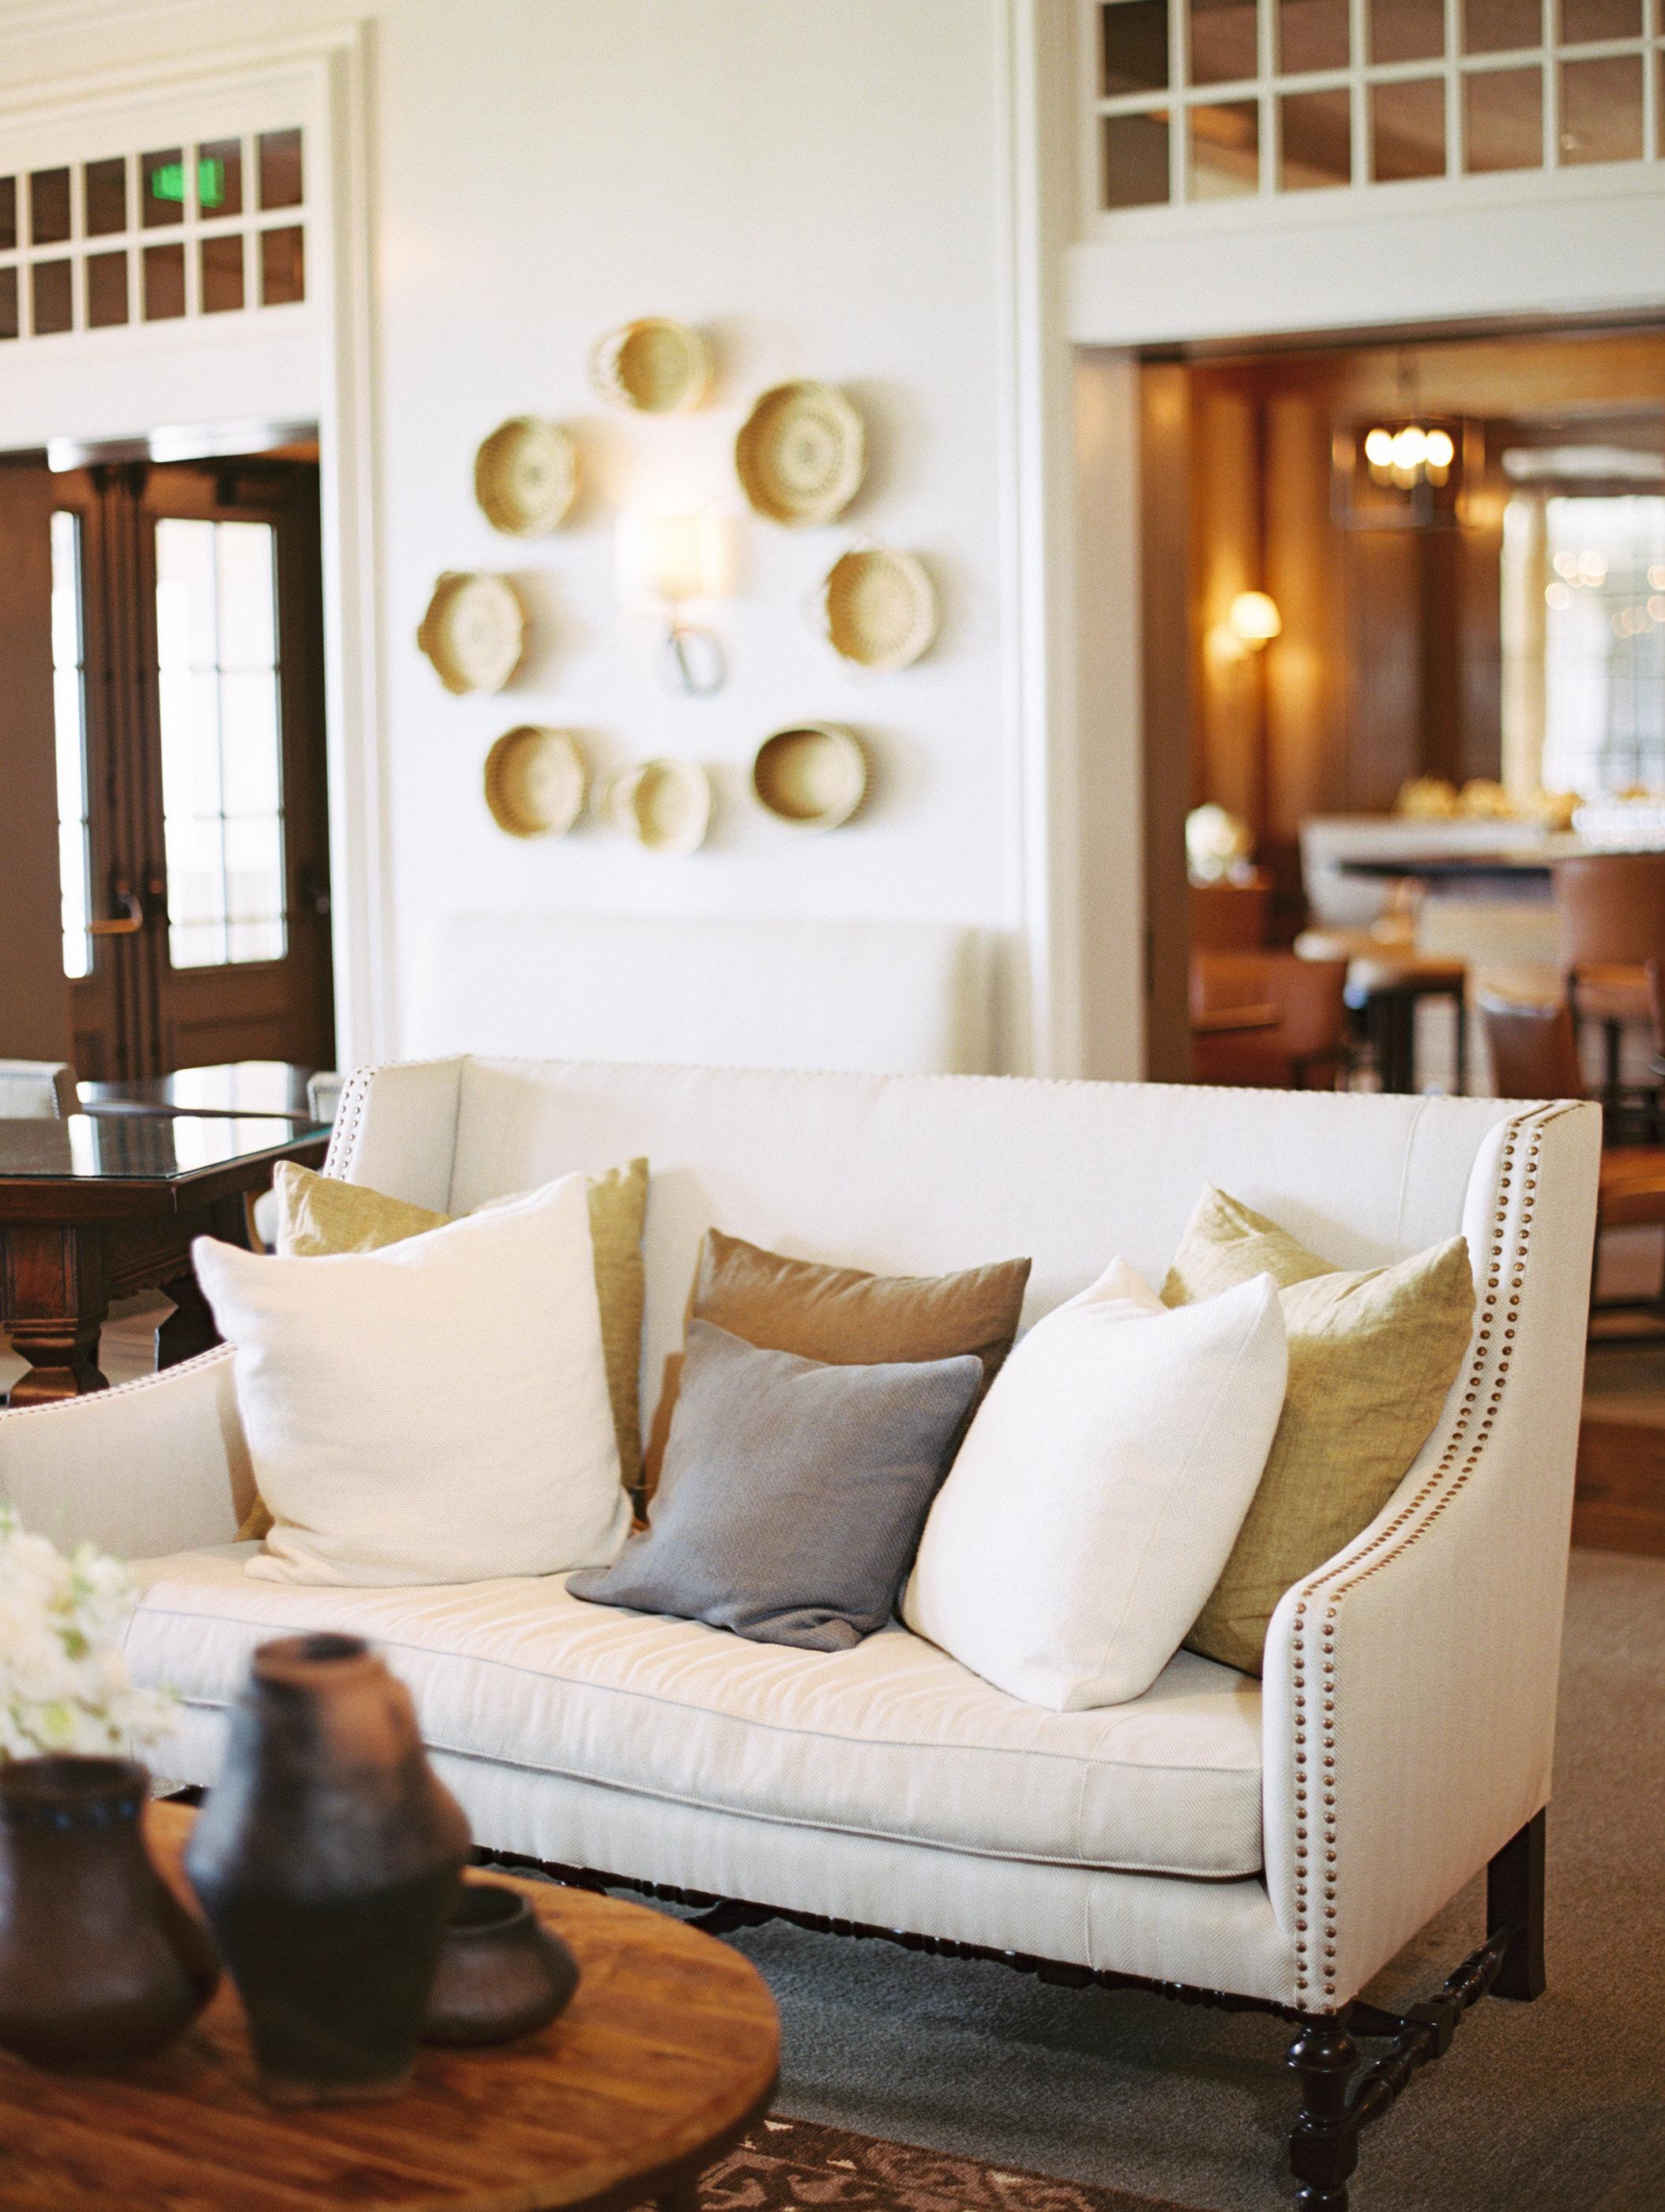 Venue Details - Kiawah Island, South Carolina - Fall Wedding - Julian Leaver Events